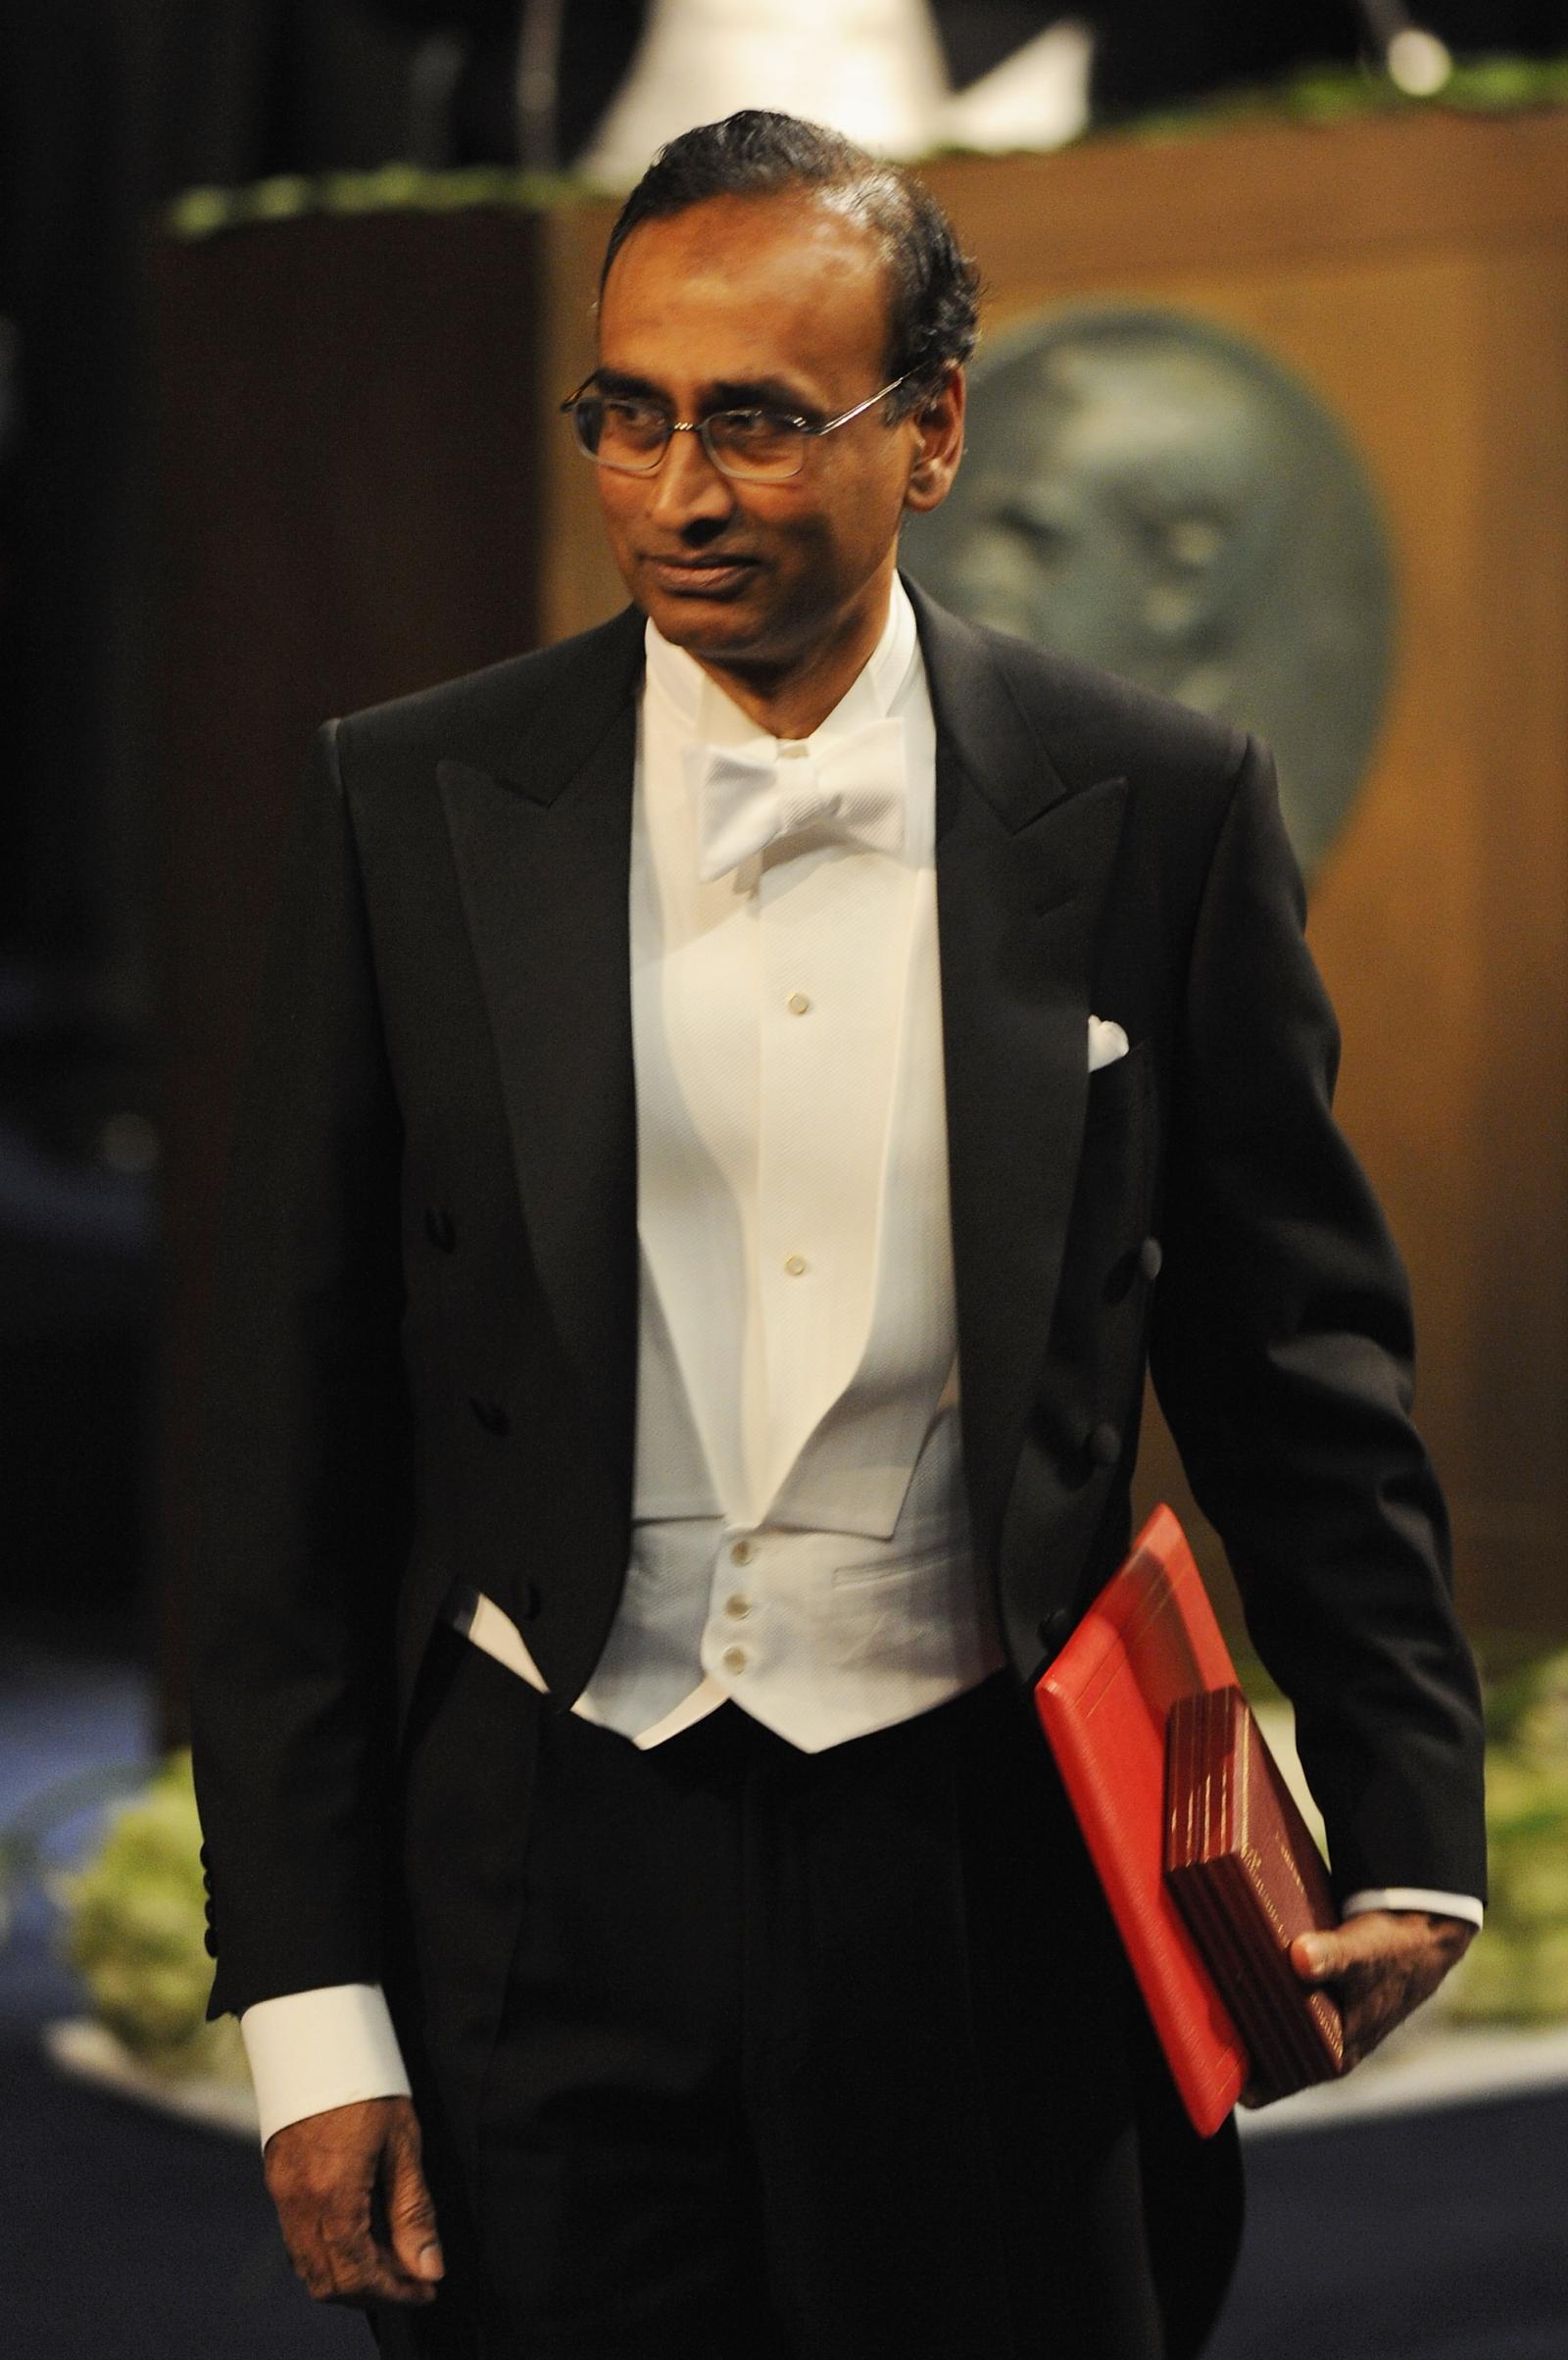 Royal Society President Venkatraman Ramakrishnan